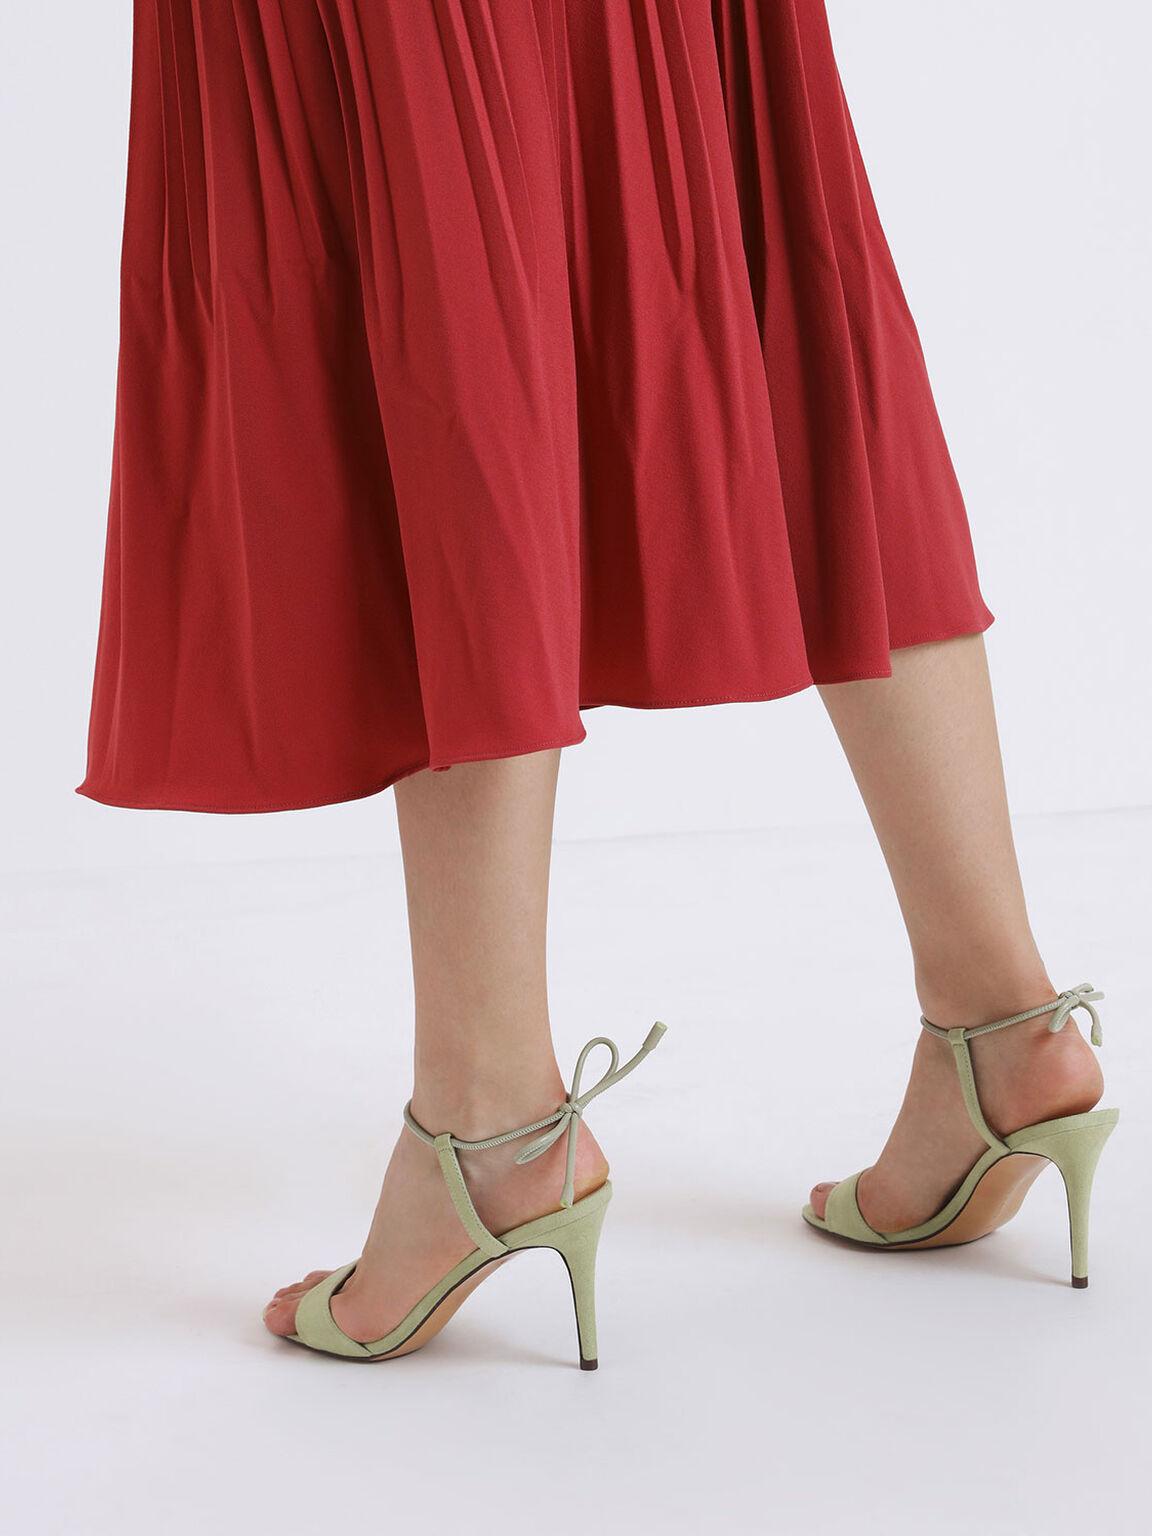 Ankle Tie Stiletto Sandals, Green, hi-res